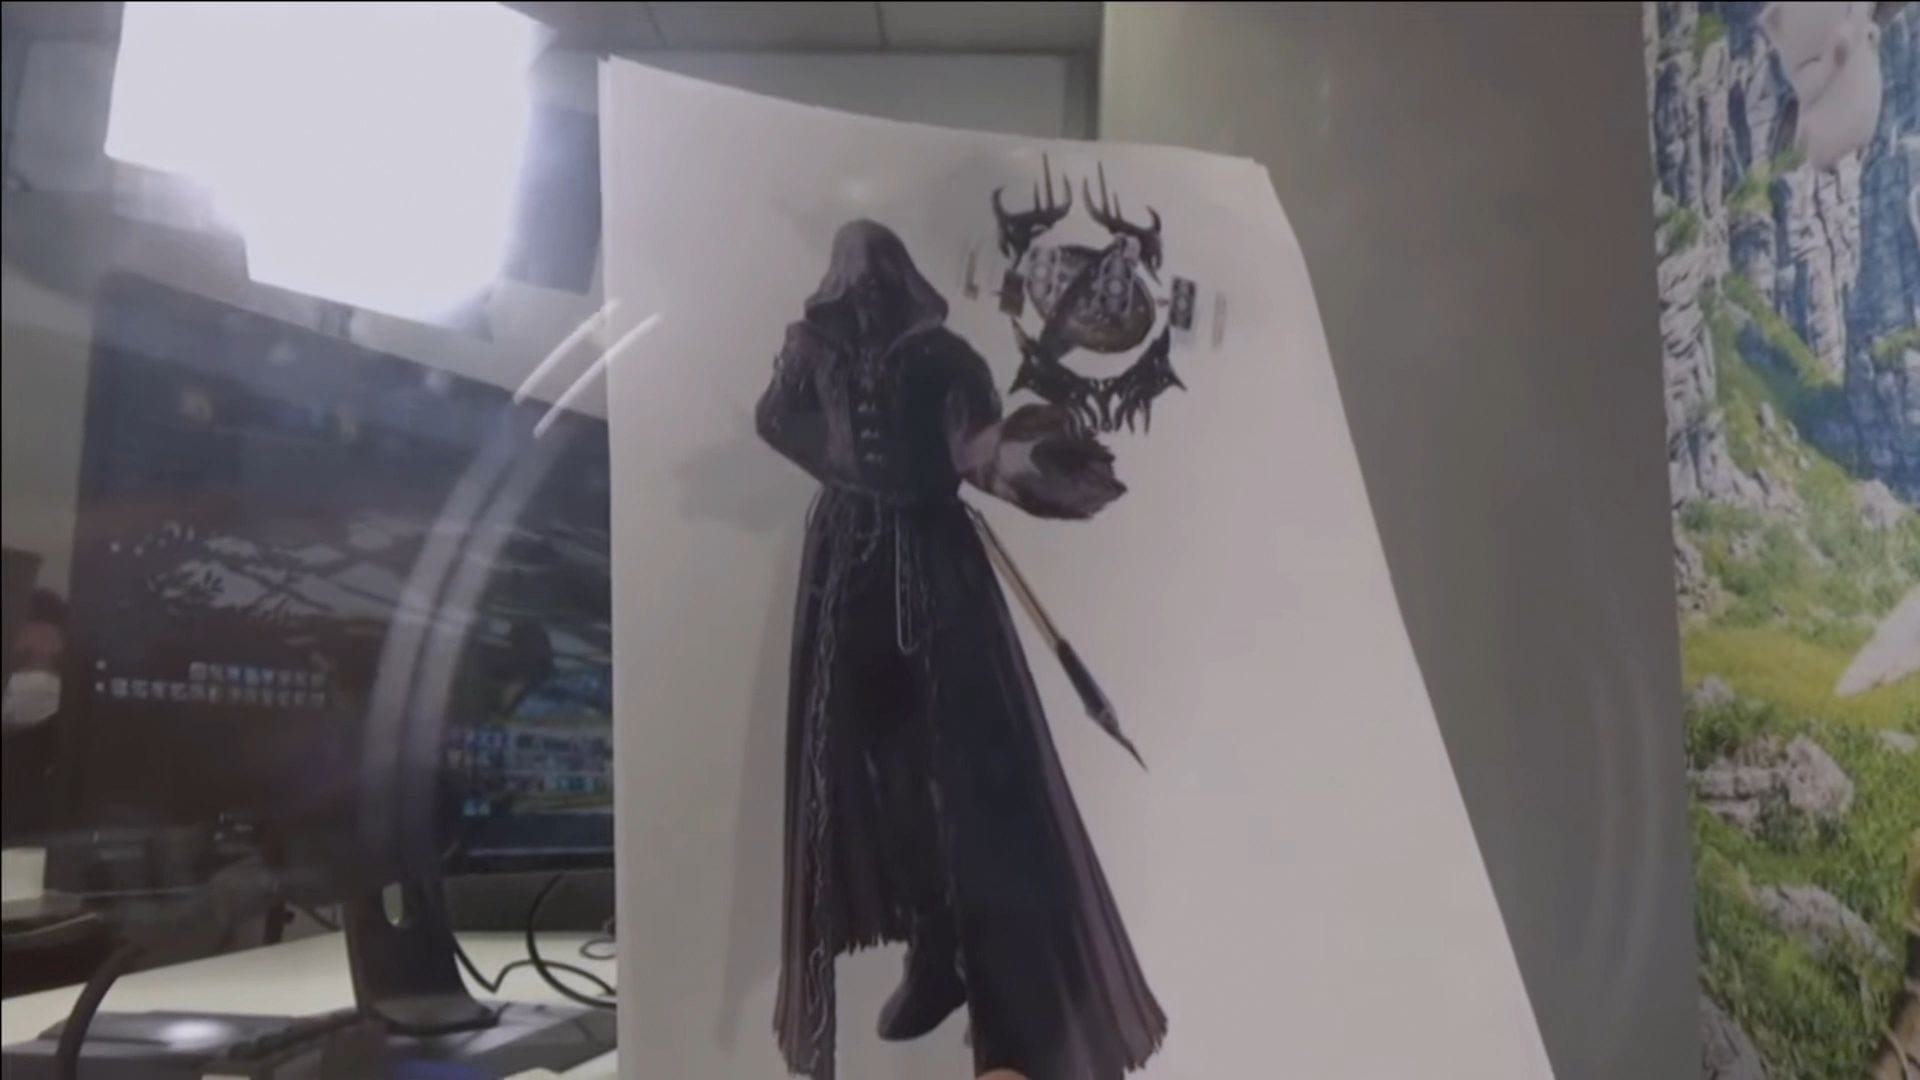 Final-Fantasy-XIV-Screenshot-2020-11-27-13-39-43-1.jpg